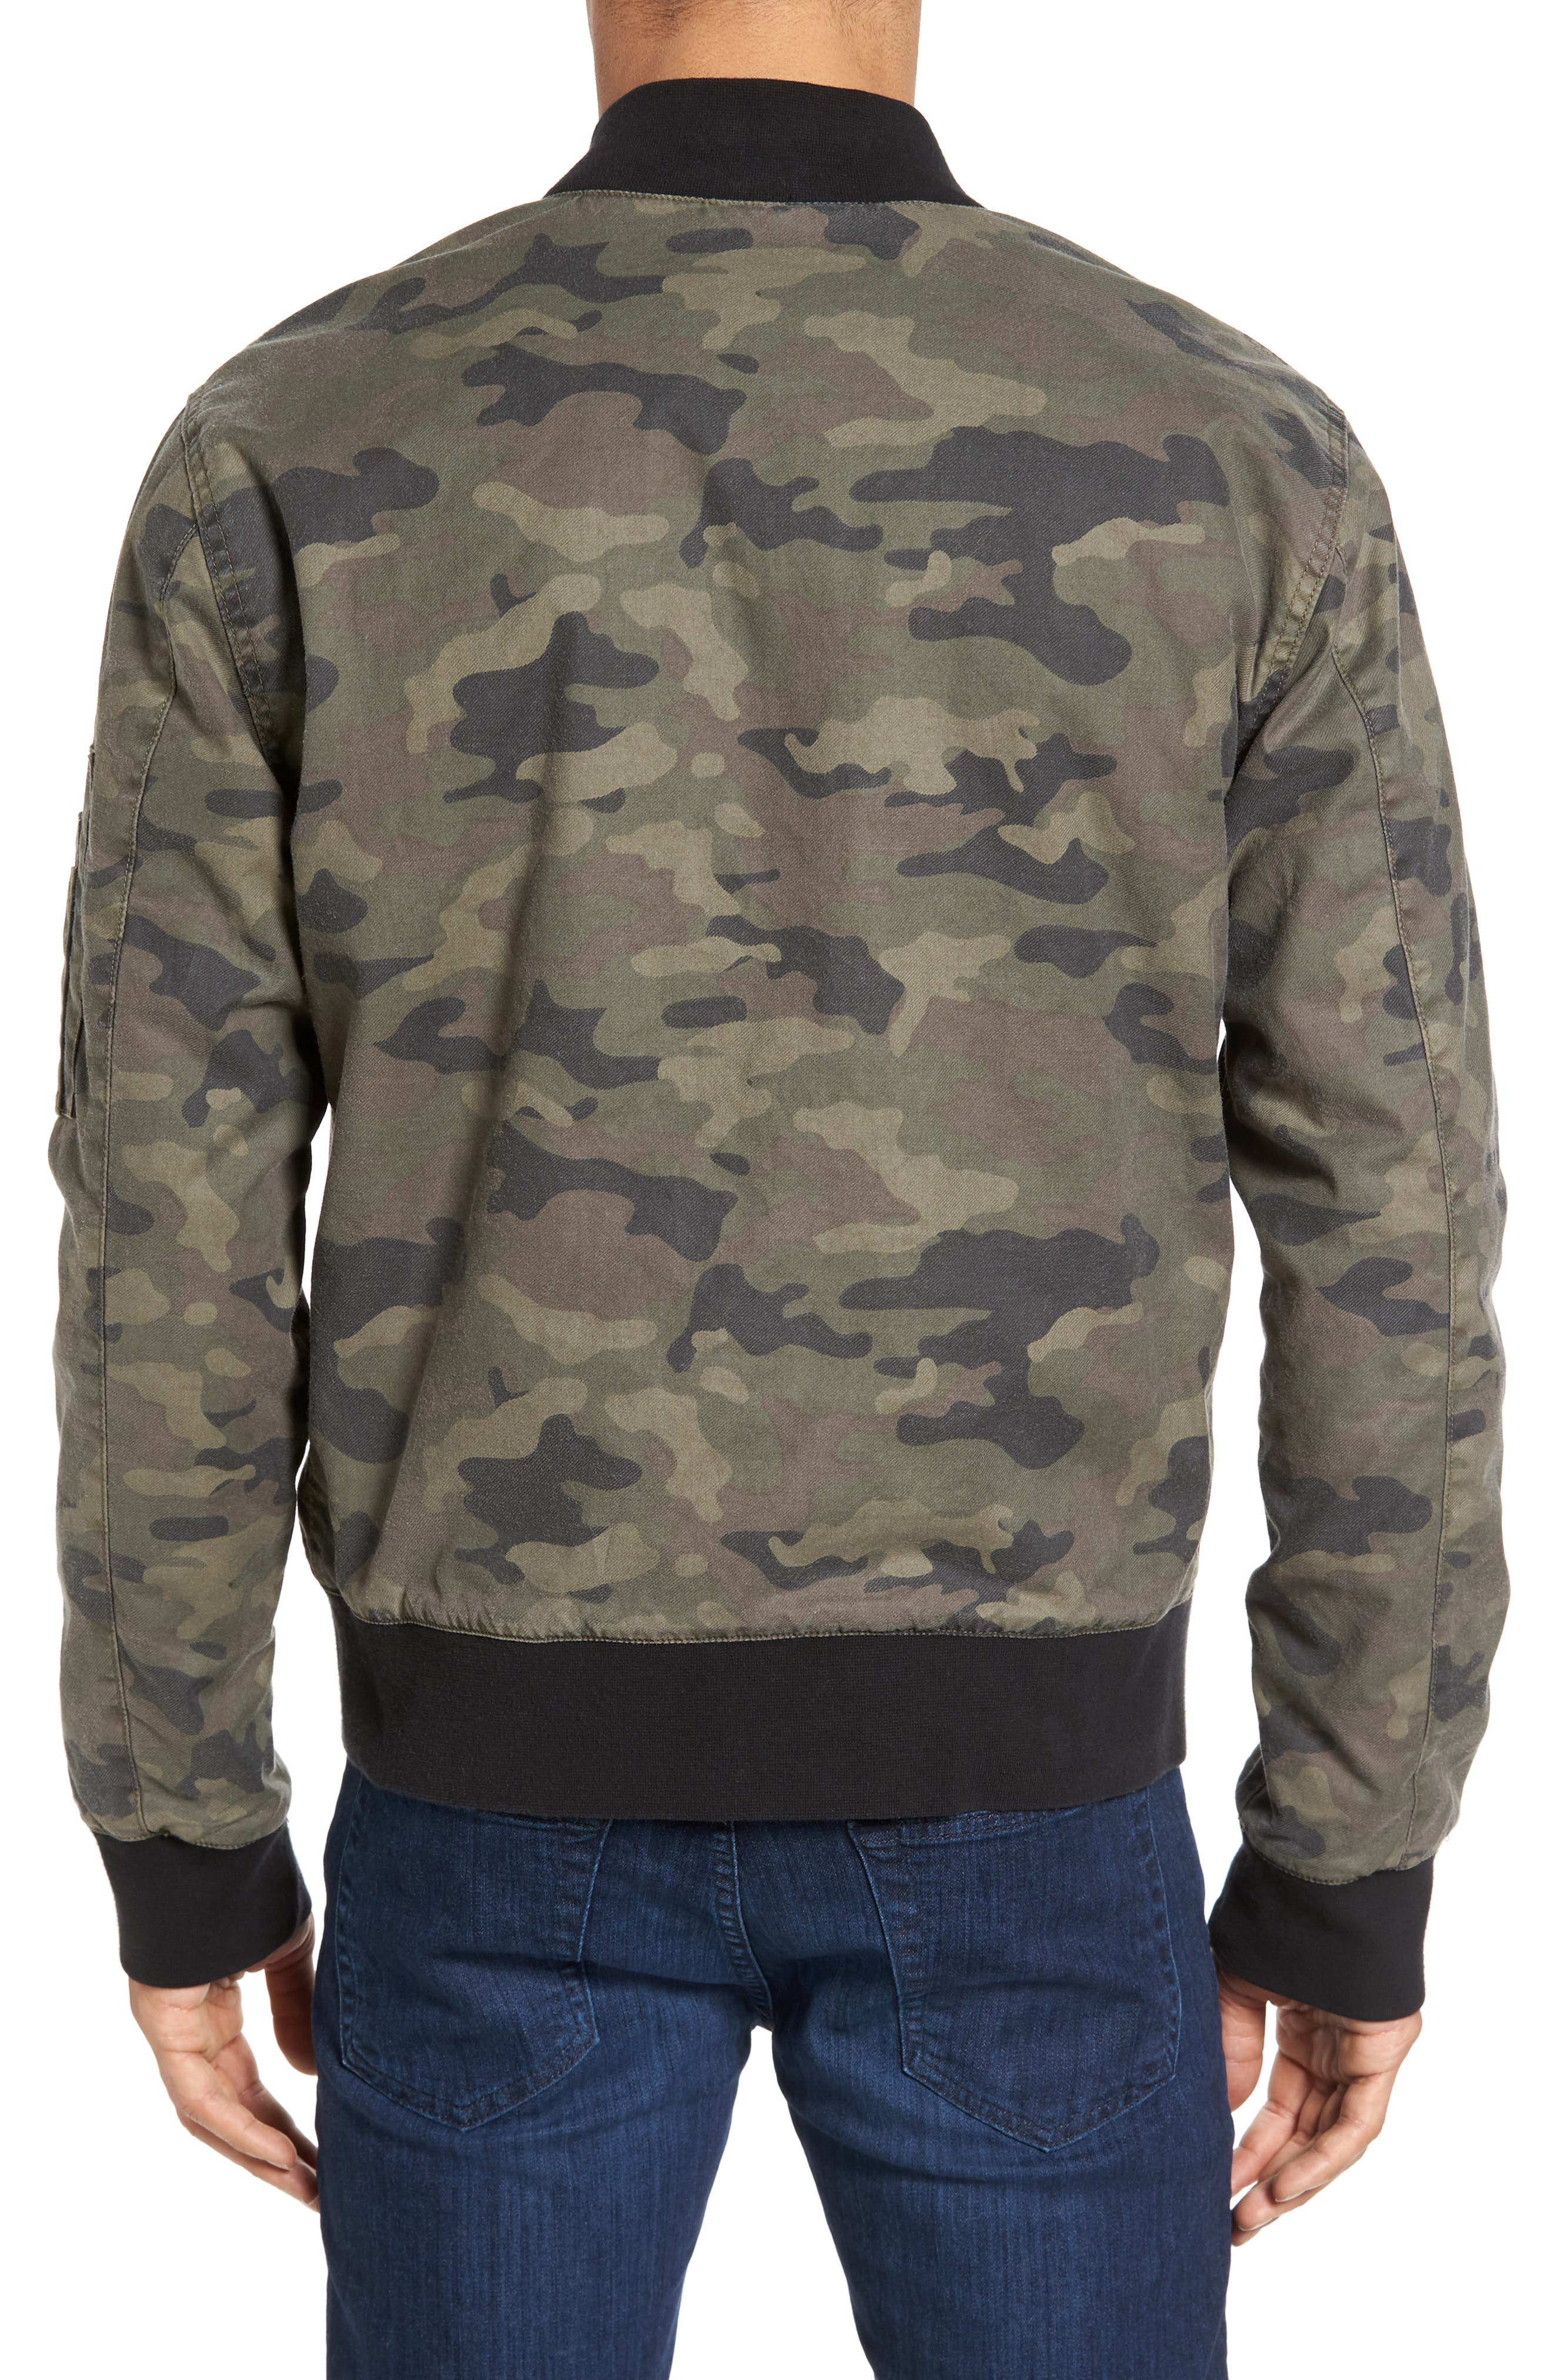 Knox Twill Bomber Jacket,                             Alternate thumbnail 2, color,                             Infantry Camo